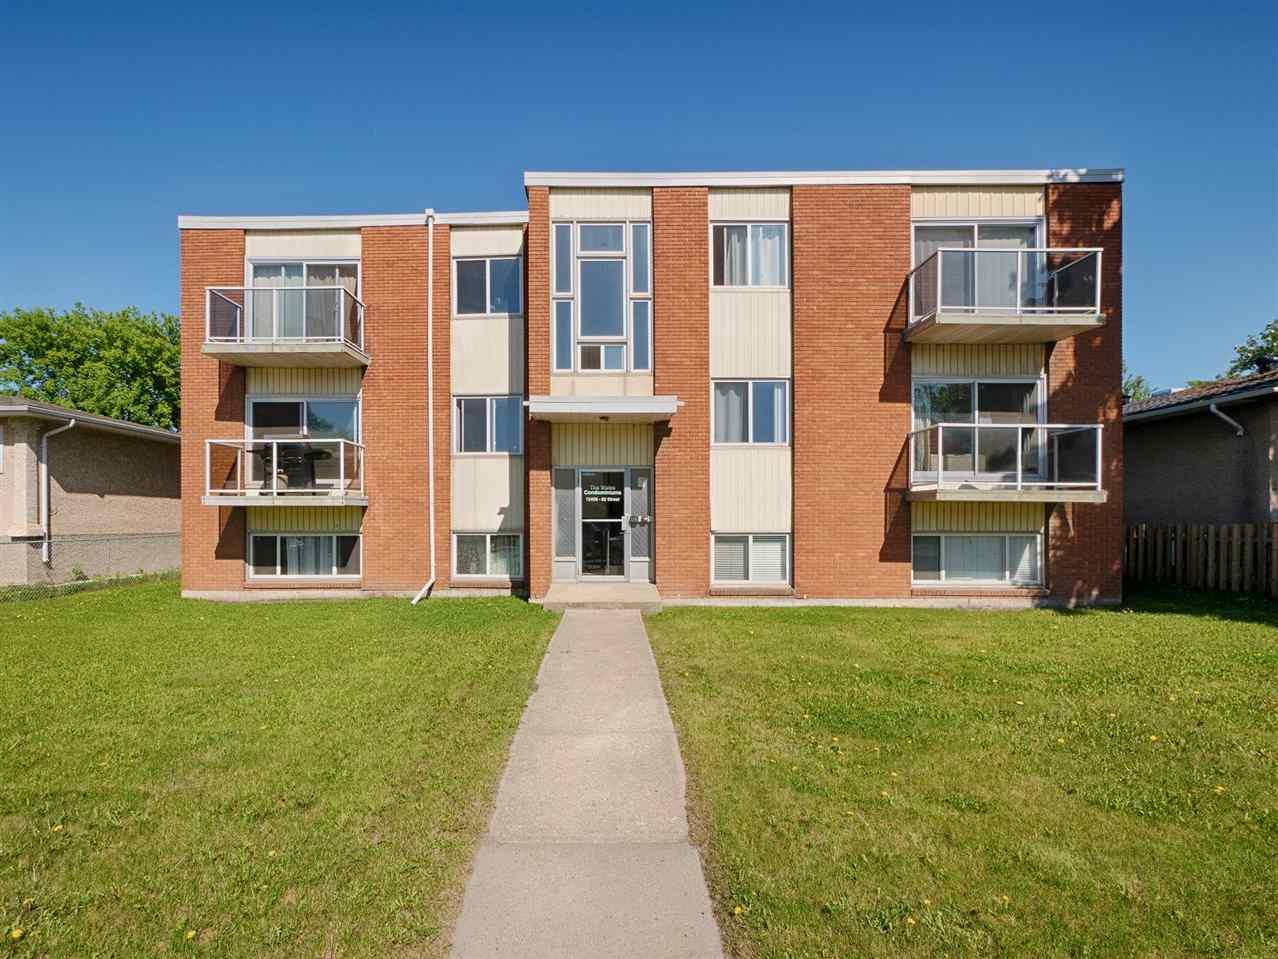 201 12409 82 Street, 1 bed, 1 bath, at $89,000